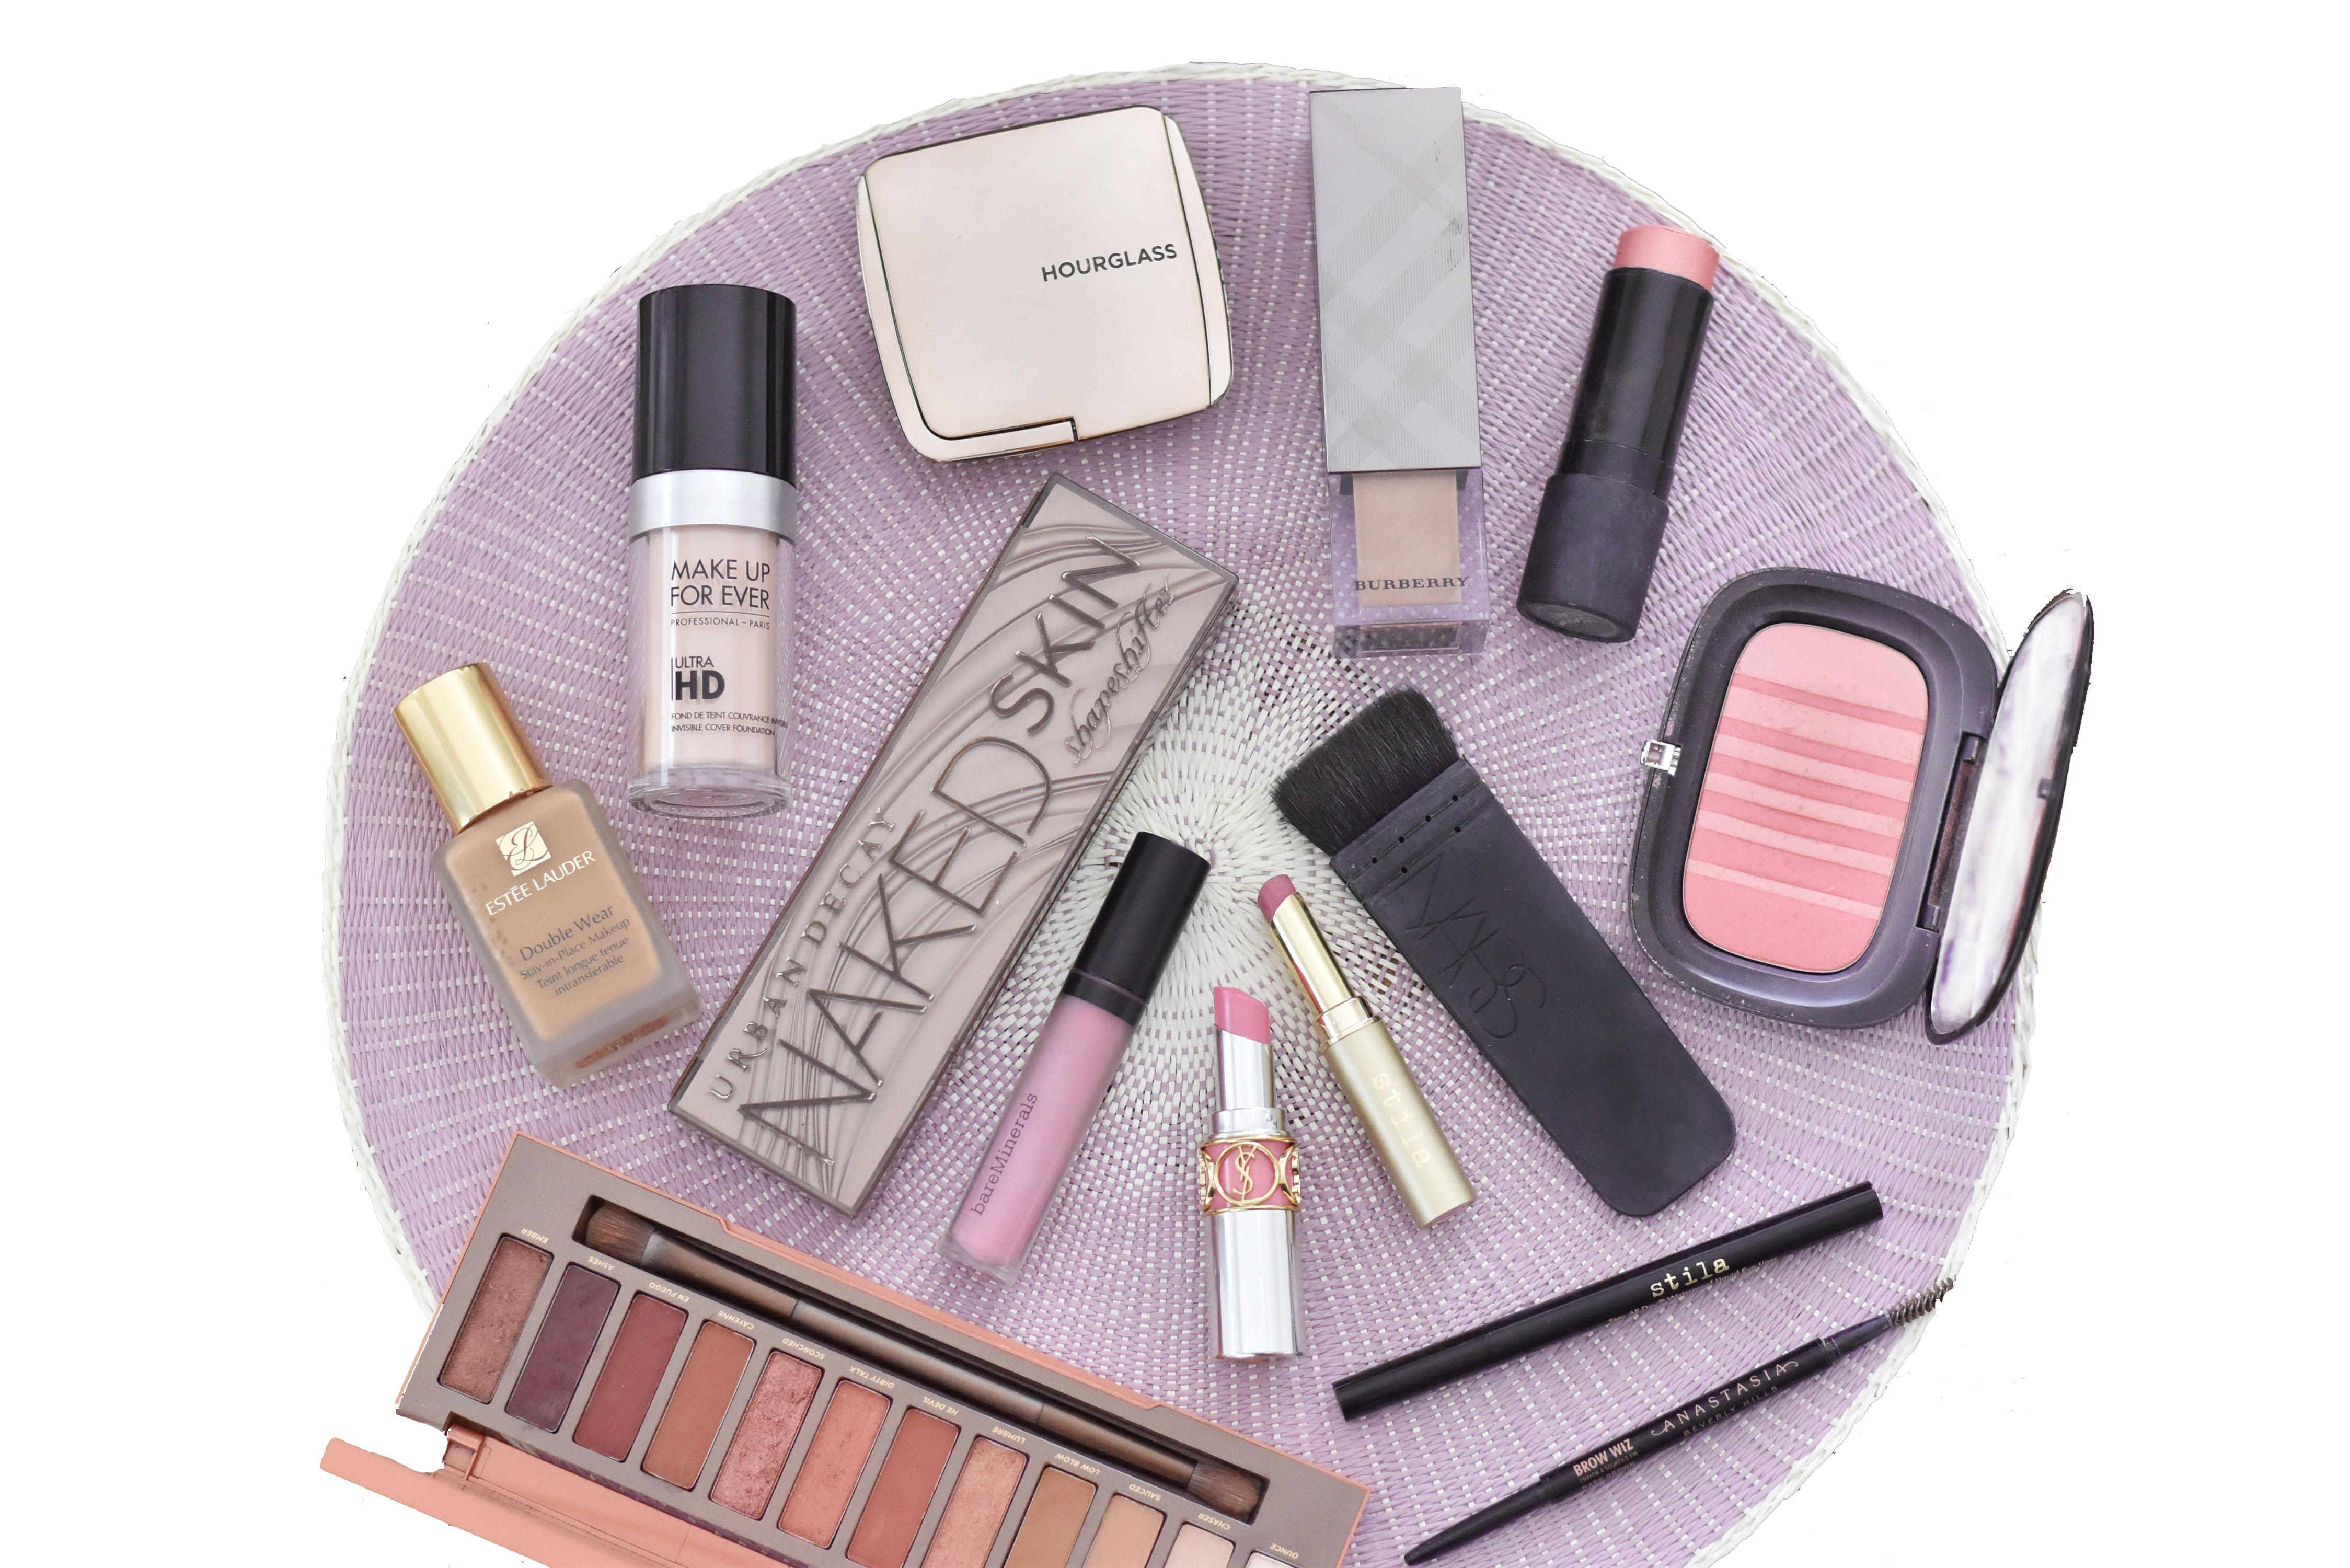 Sephora Spring sale - everyday makeup